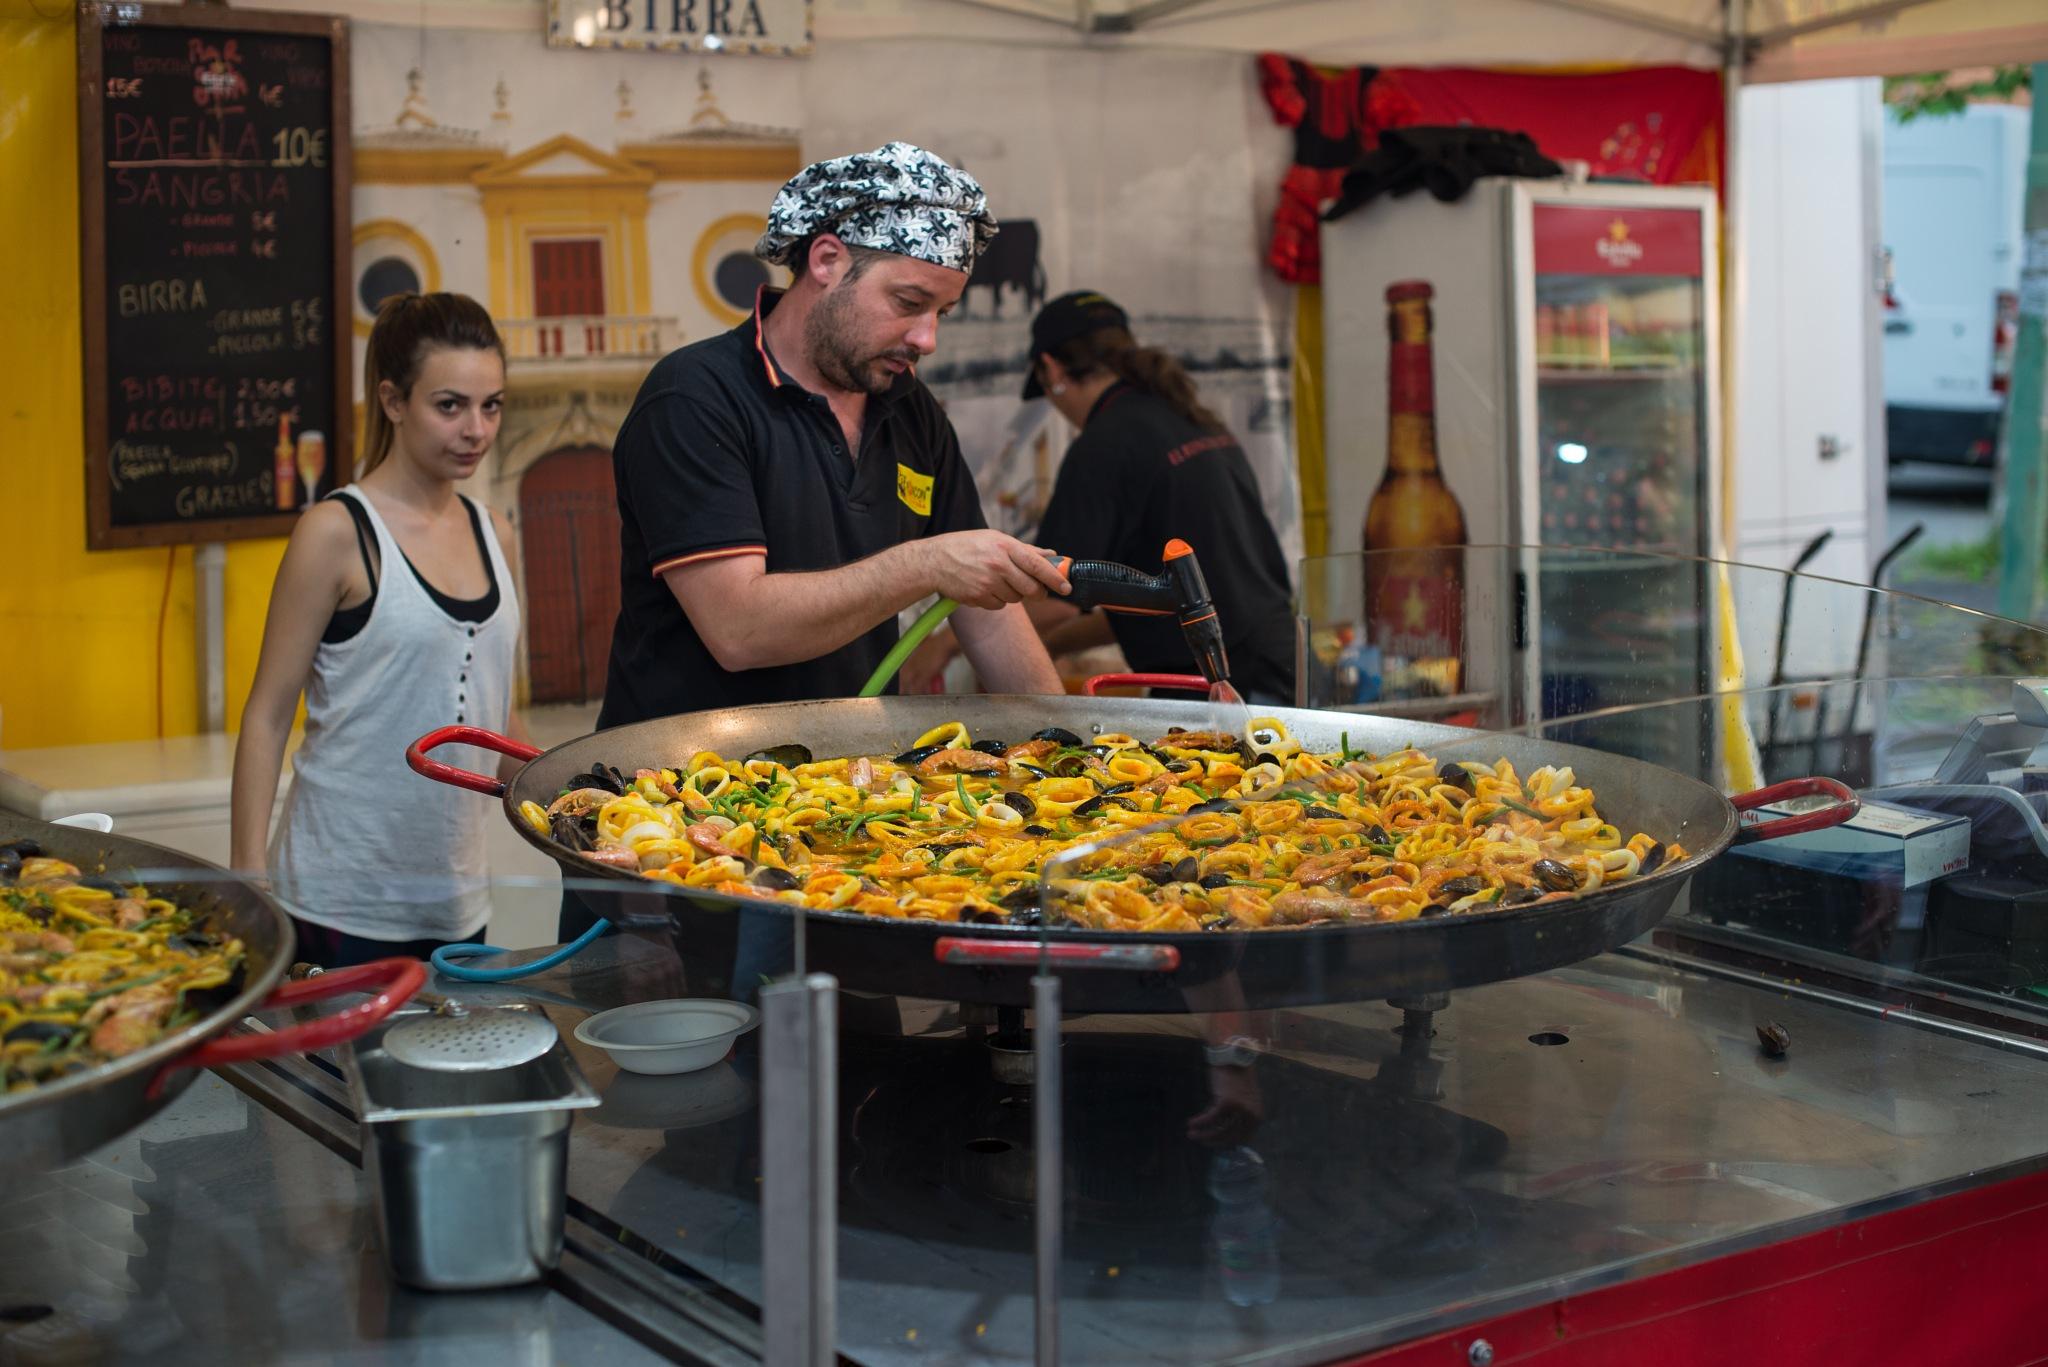 ¡Paella para todos! by Michele Masoero